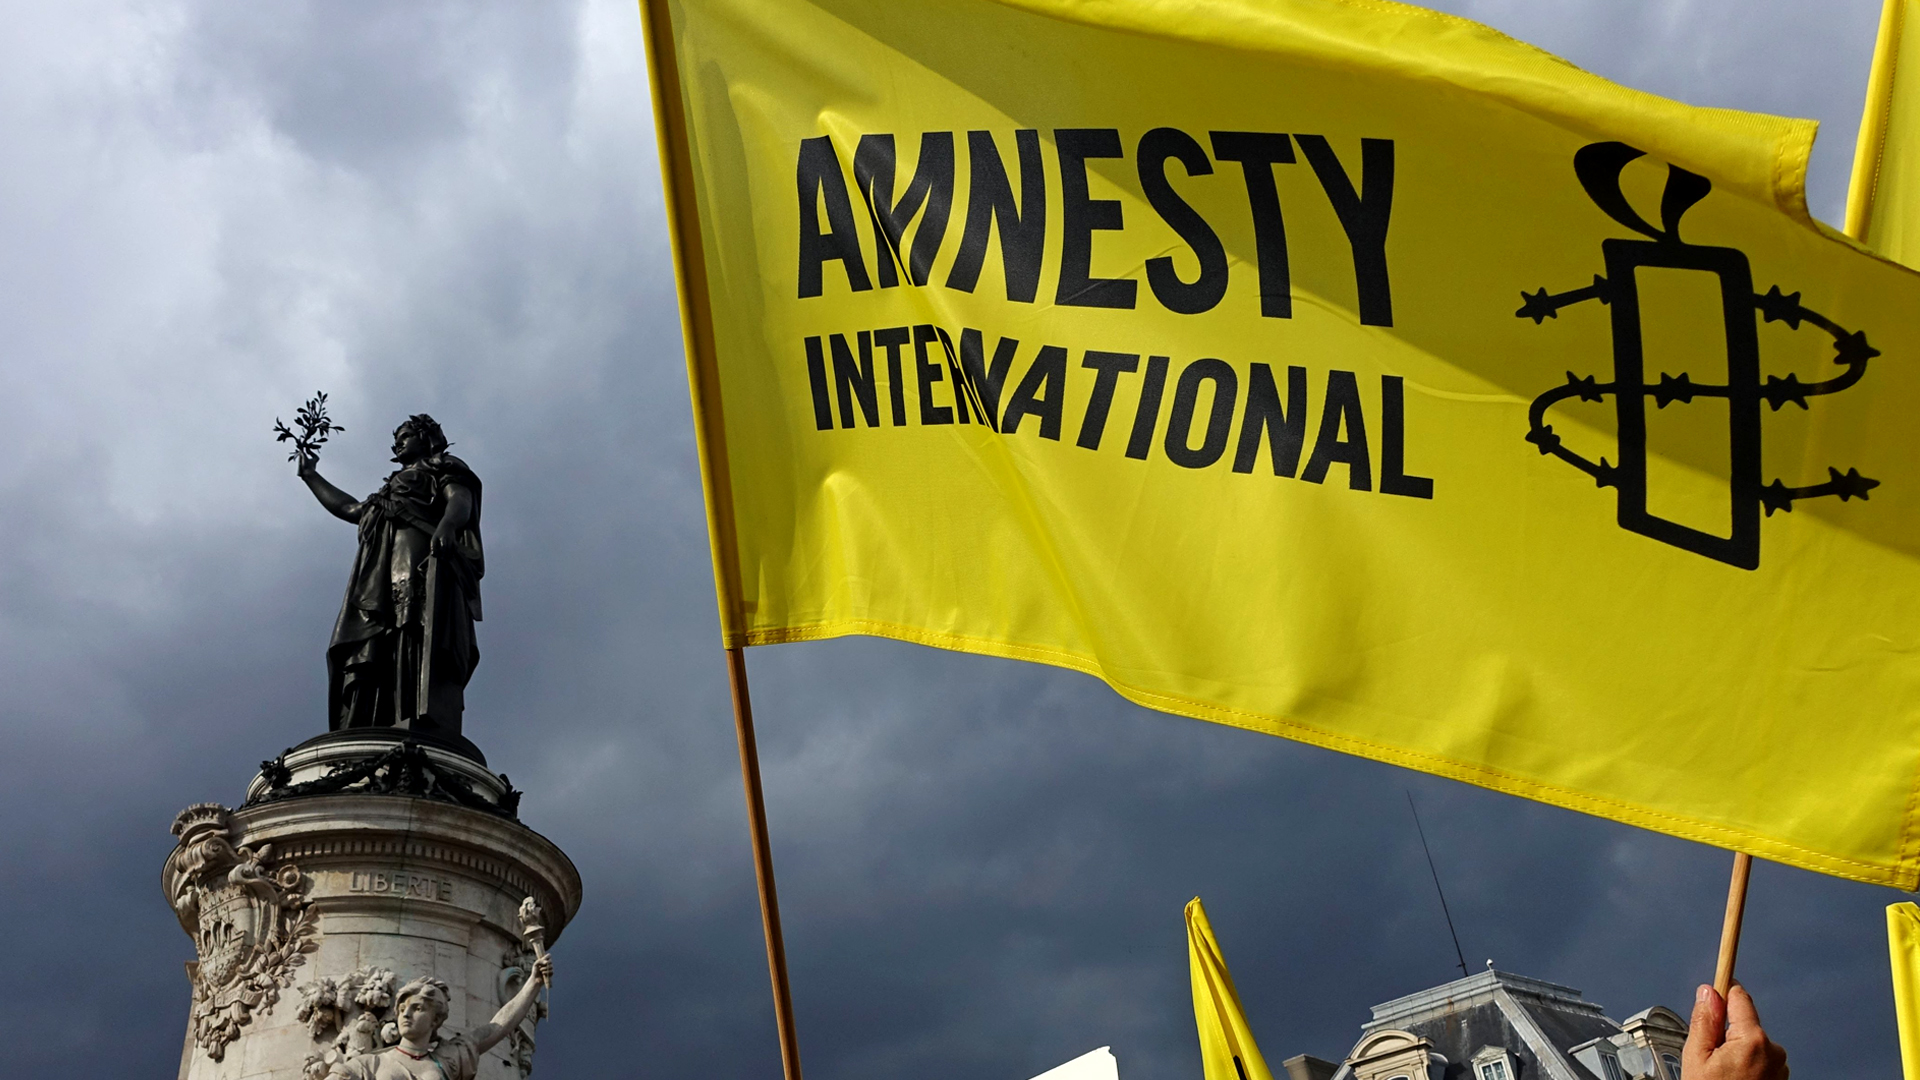 Accidental Air Strike: Amnesty Intl Tells FG To Probe Military